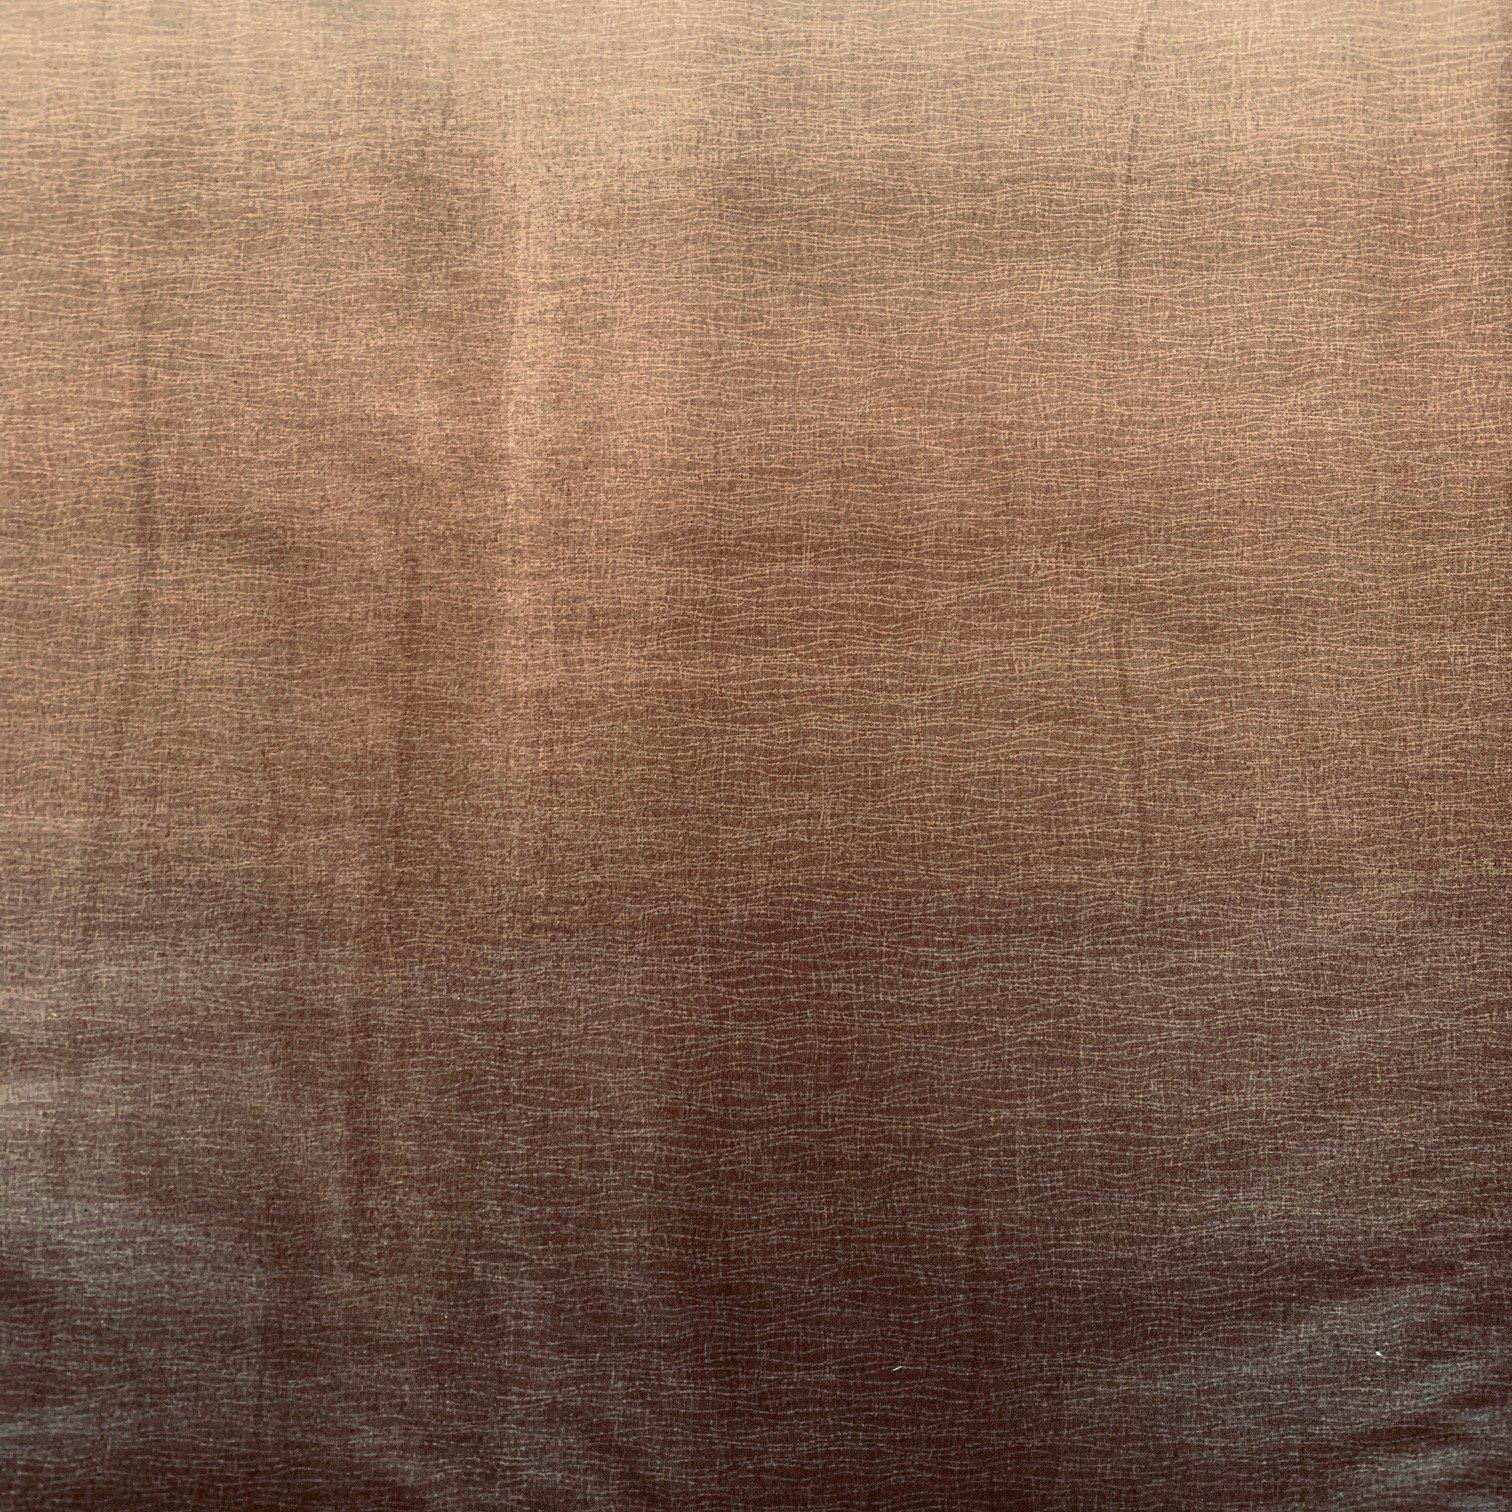 Gelato Serenity Basics - Ombre - Brown